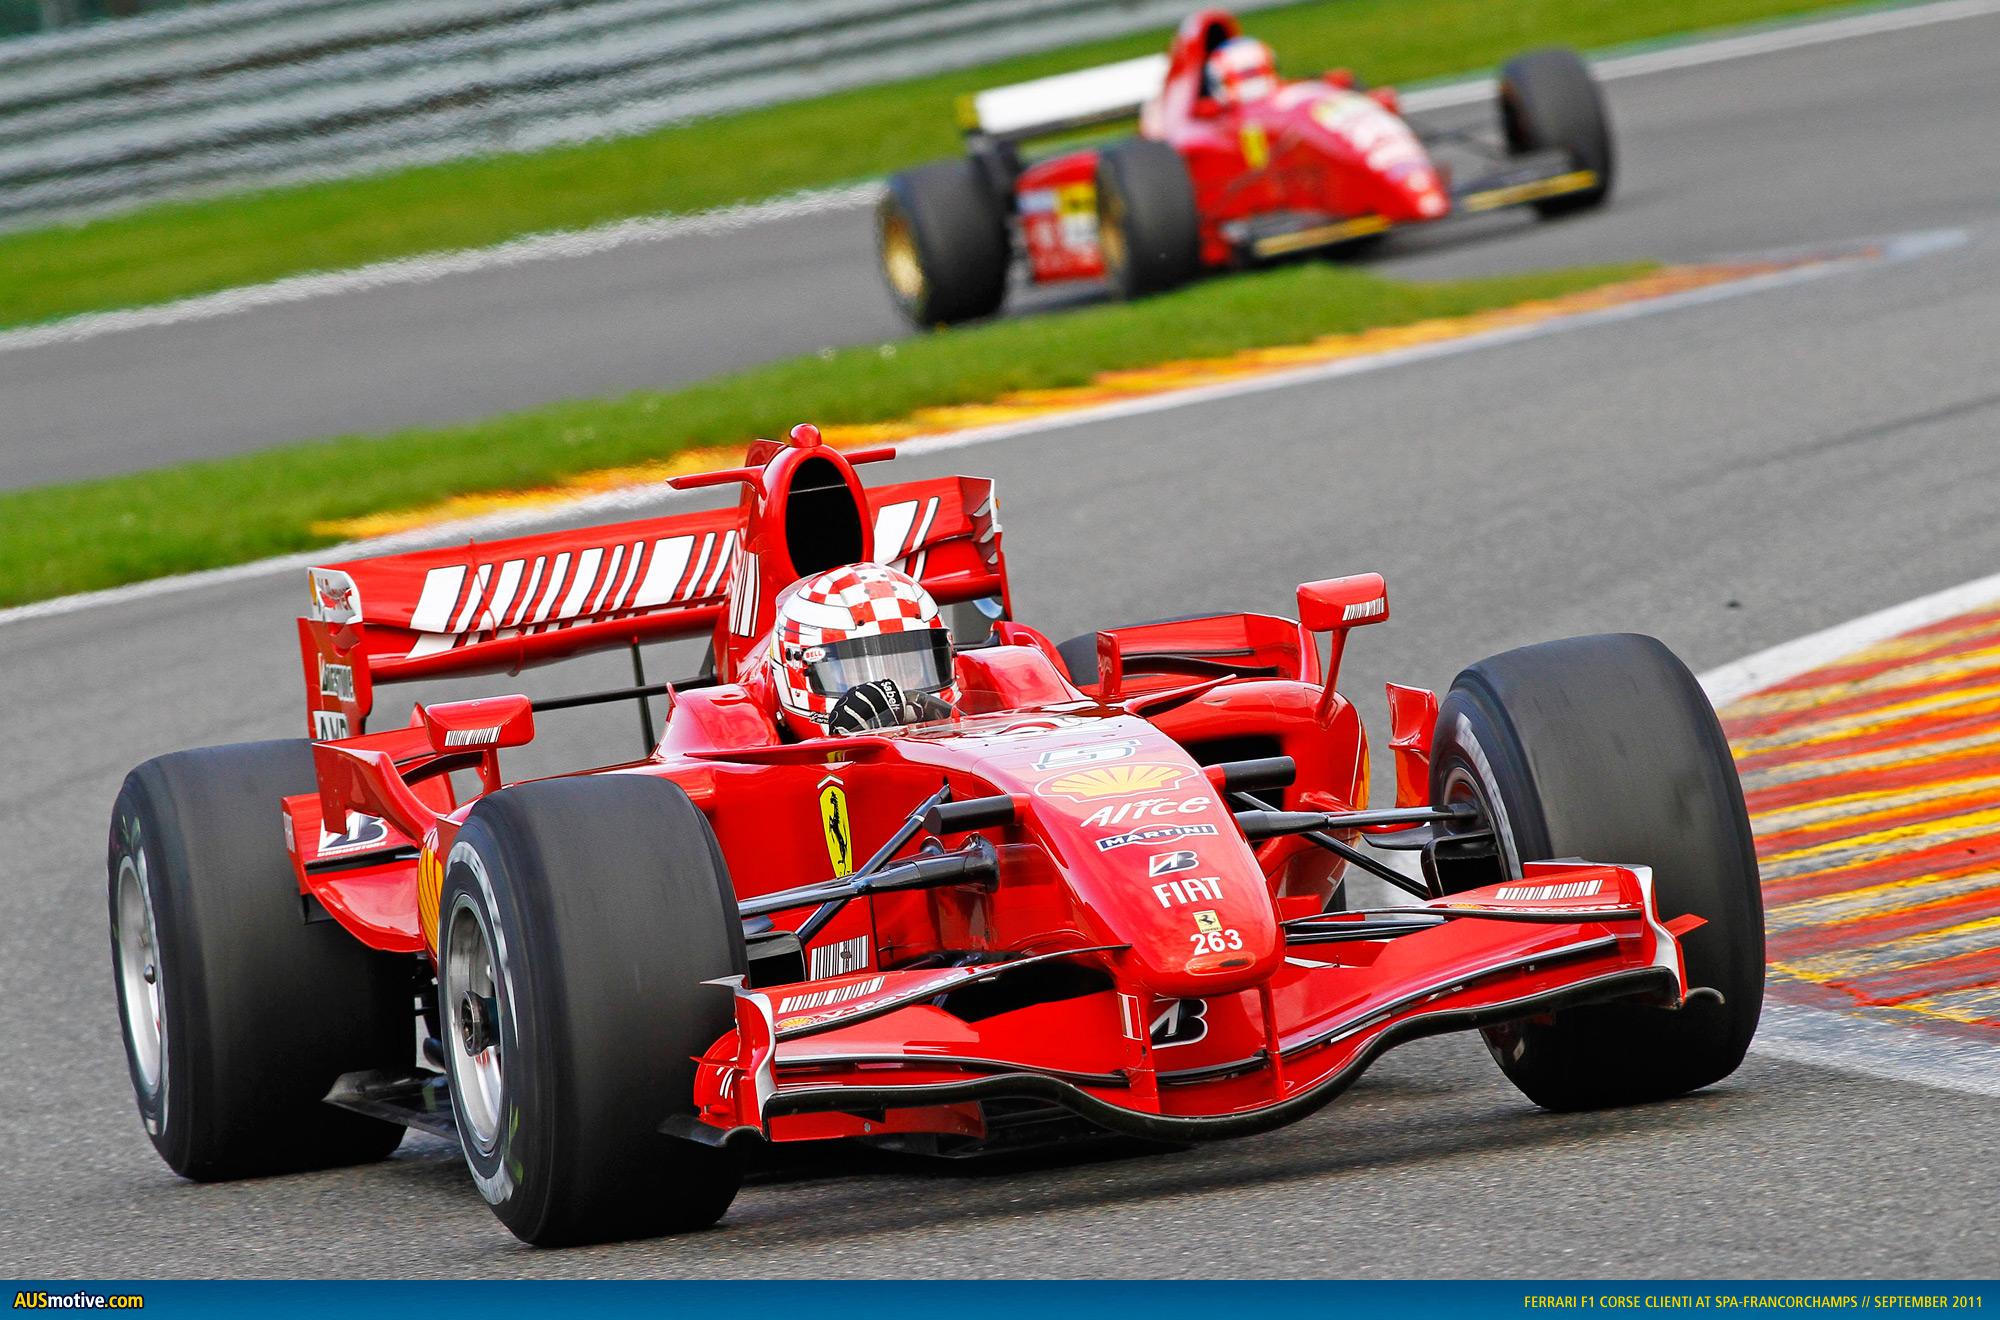 F1: AUSmotive.com » Ferrari 599XX And Historic F1 Cars At Spa